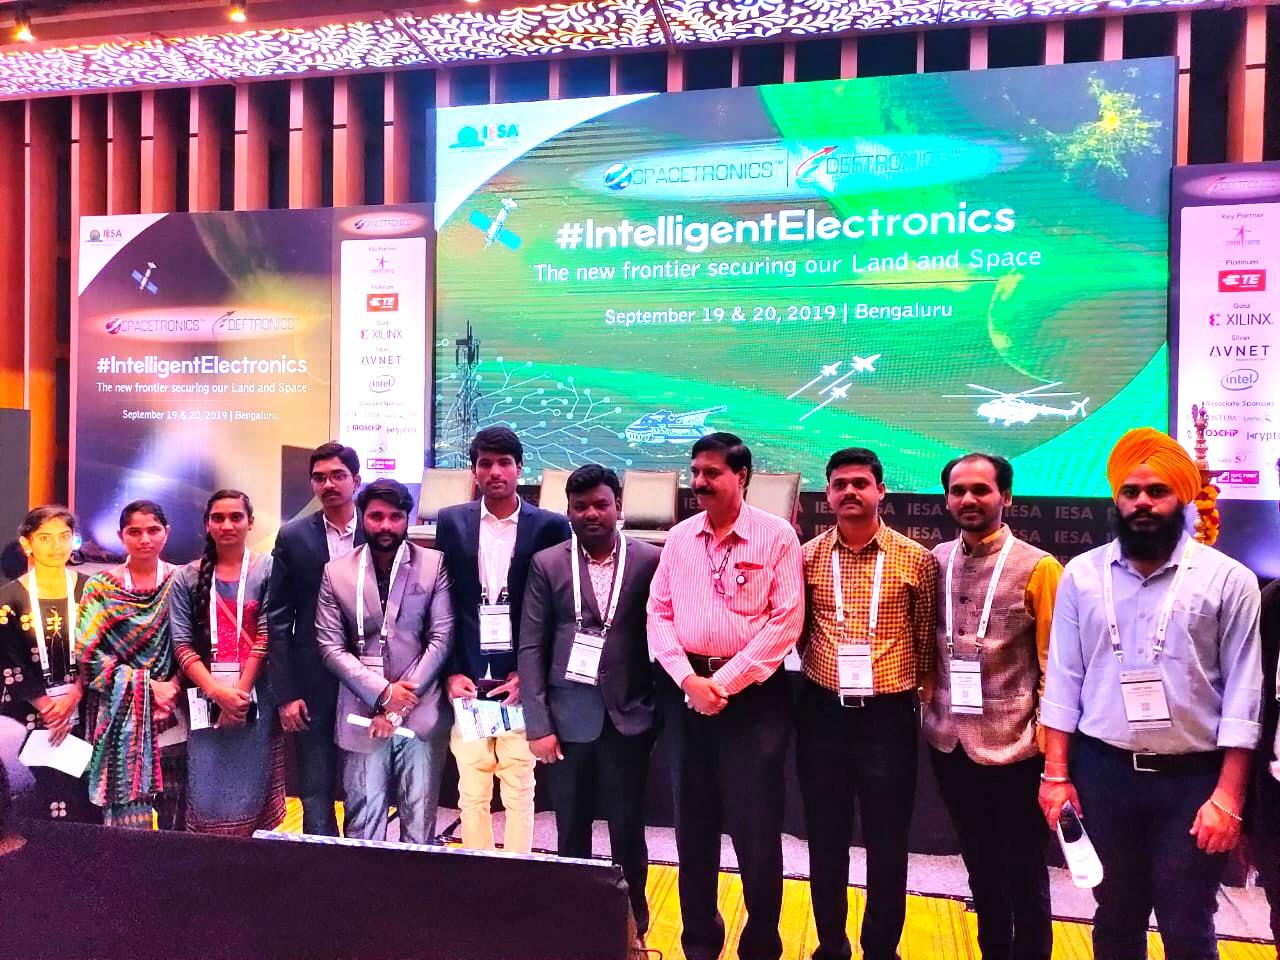 IESA Summit on Spacetronics and Deftronics-2019